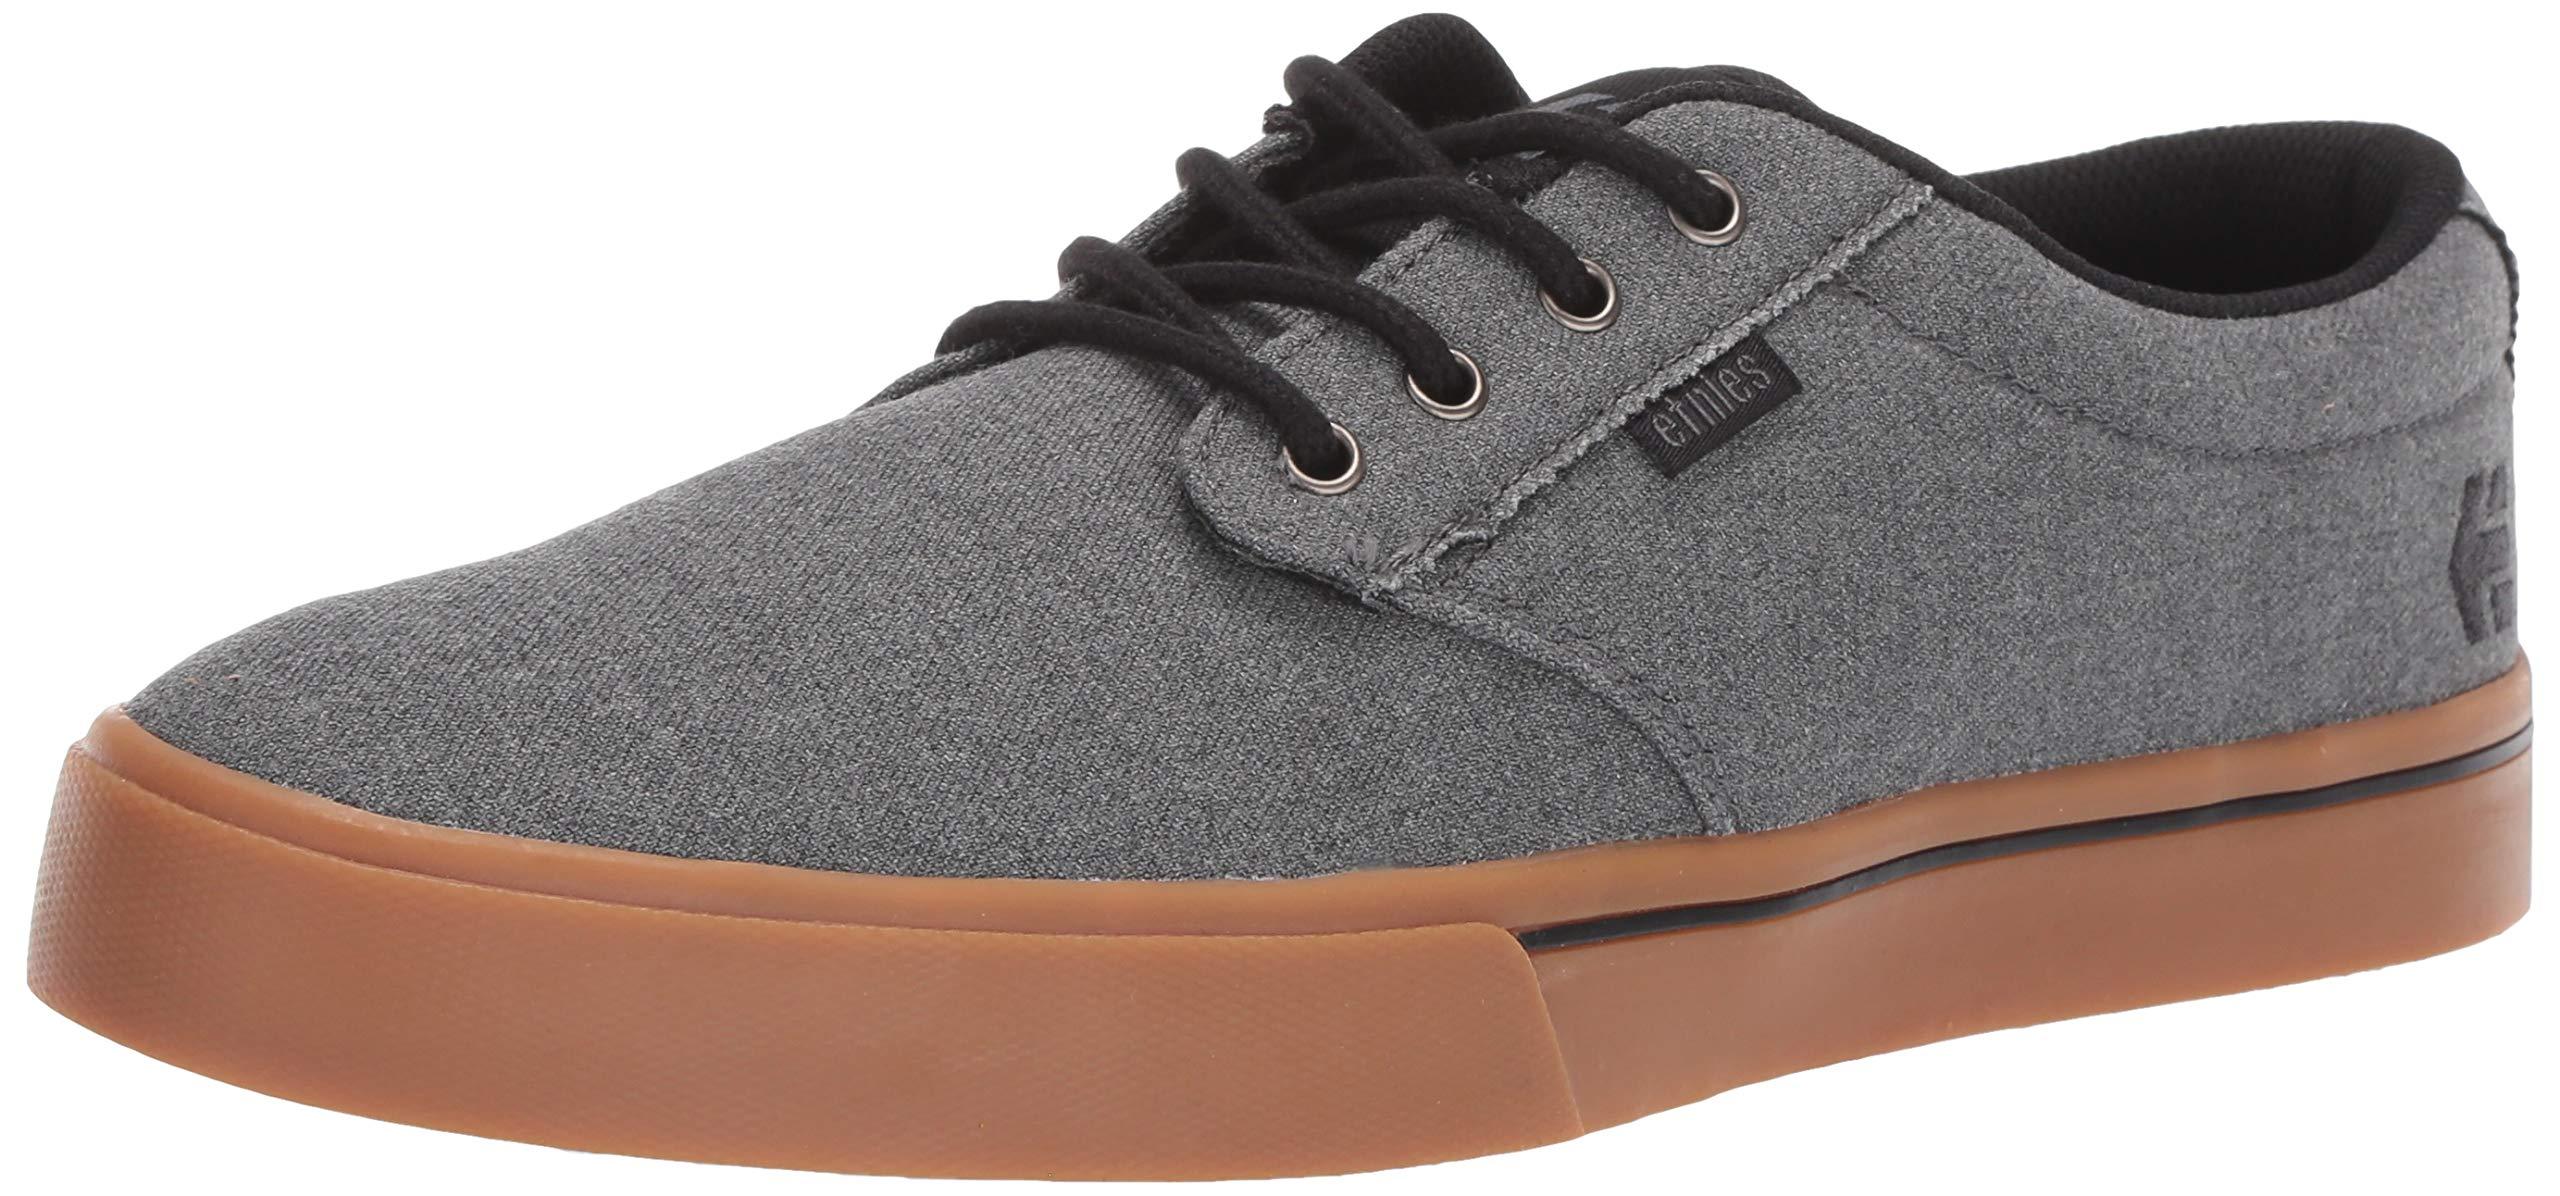 Etnies Men's Jameson 2 ECO Skate Shoe, Grey/Black/Orange, 11 Medium US